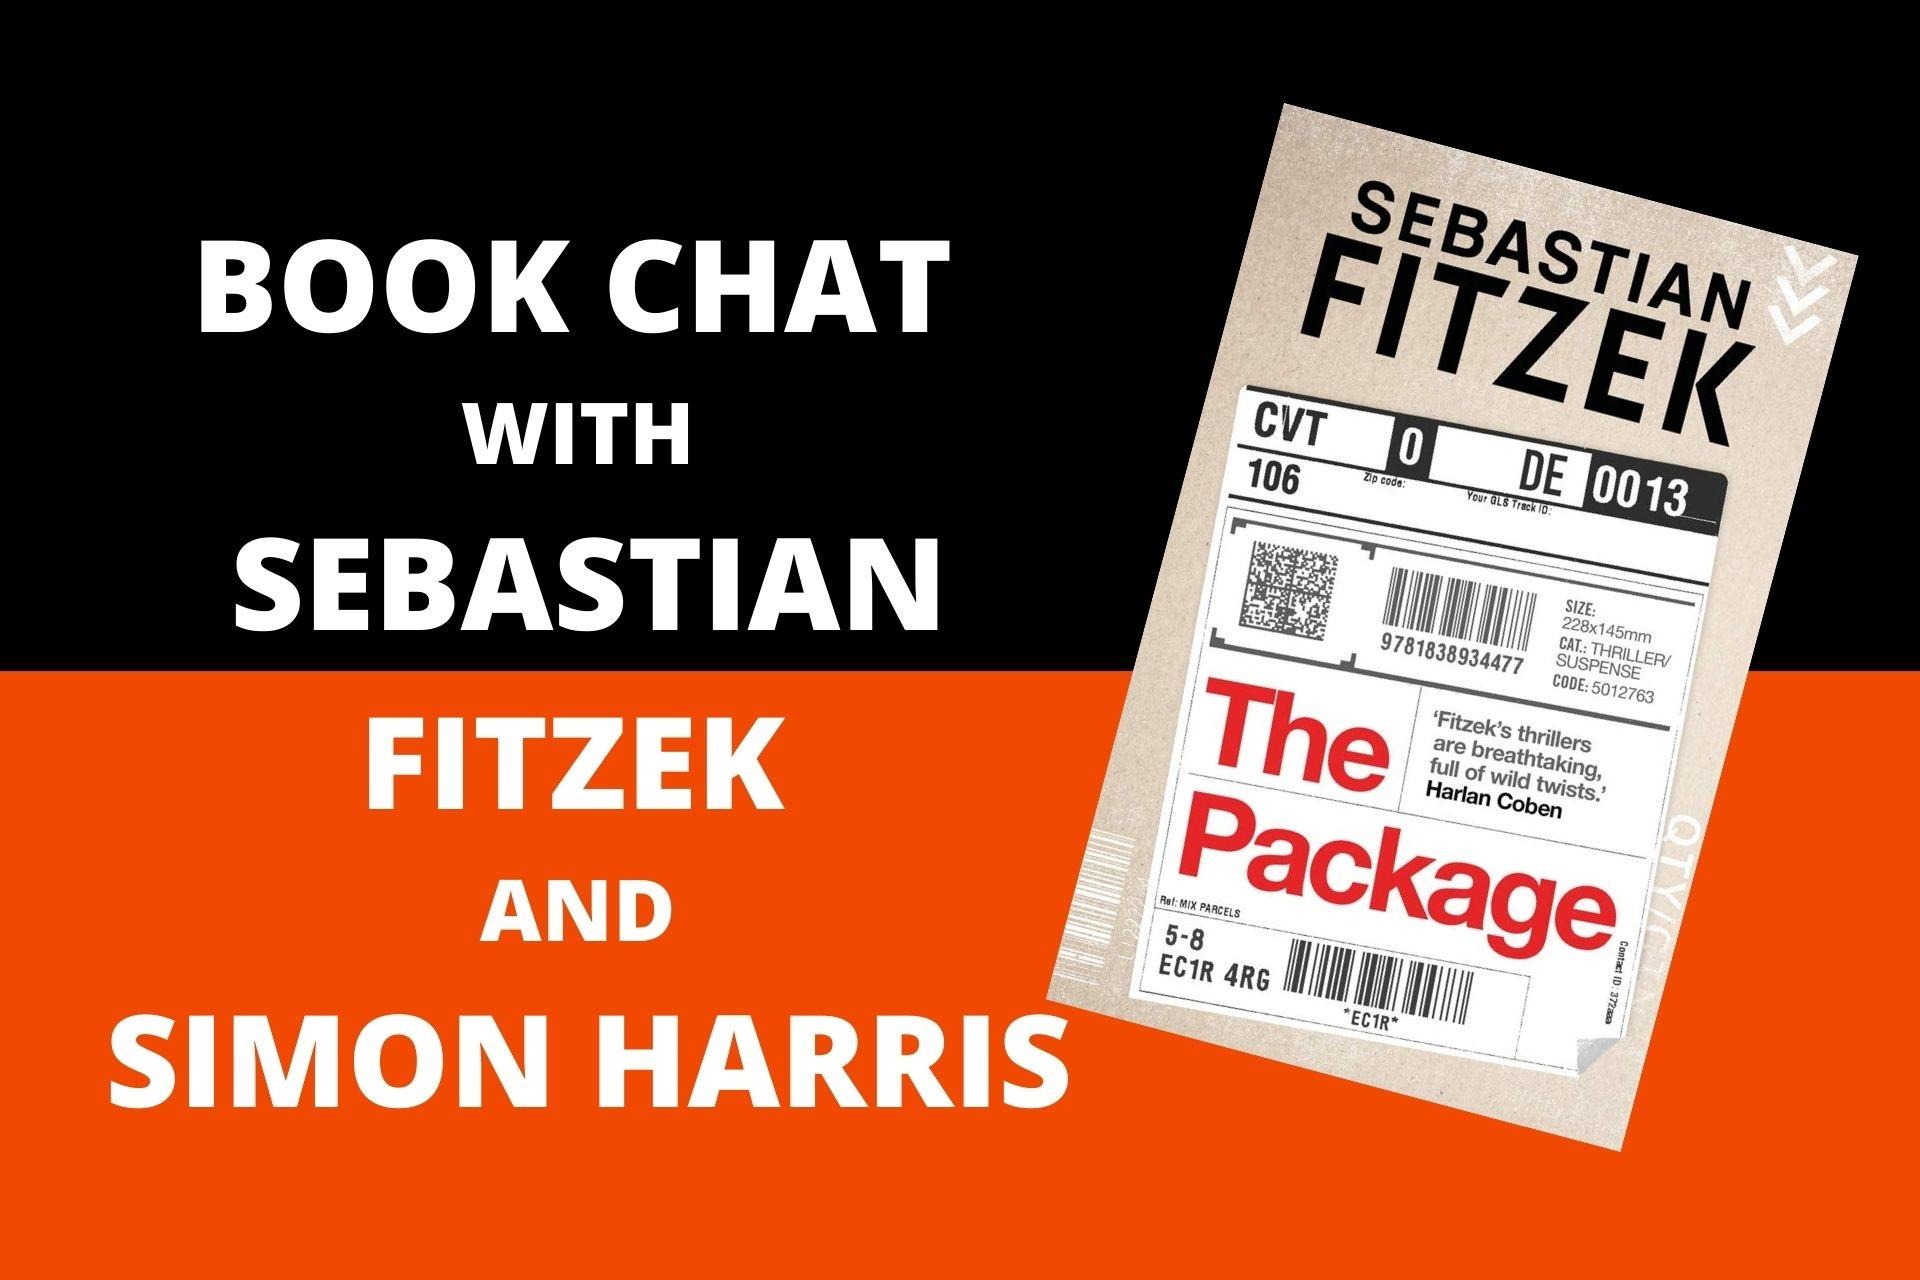 Book Chat with Sebastian Fitzek and Simon Harris